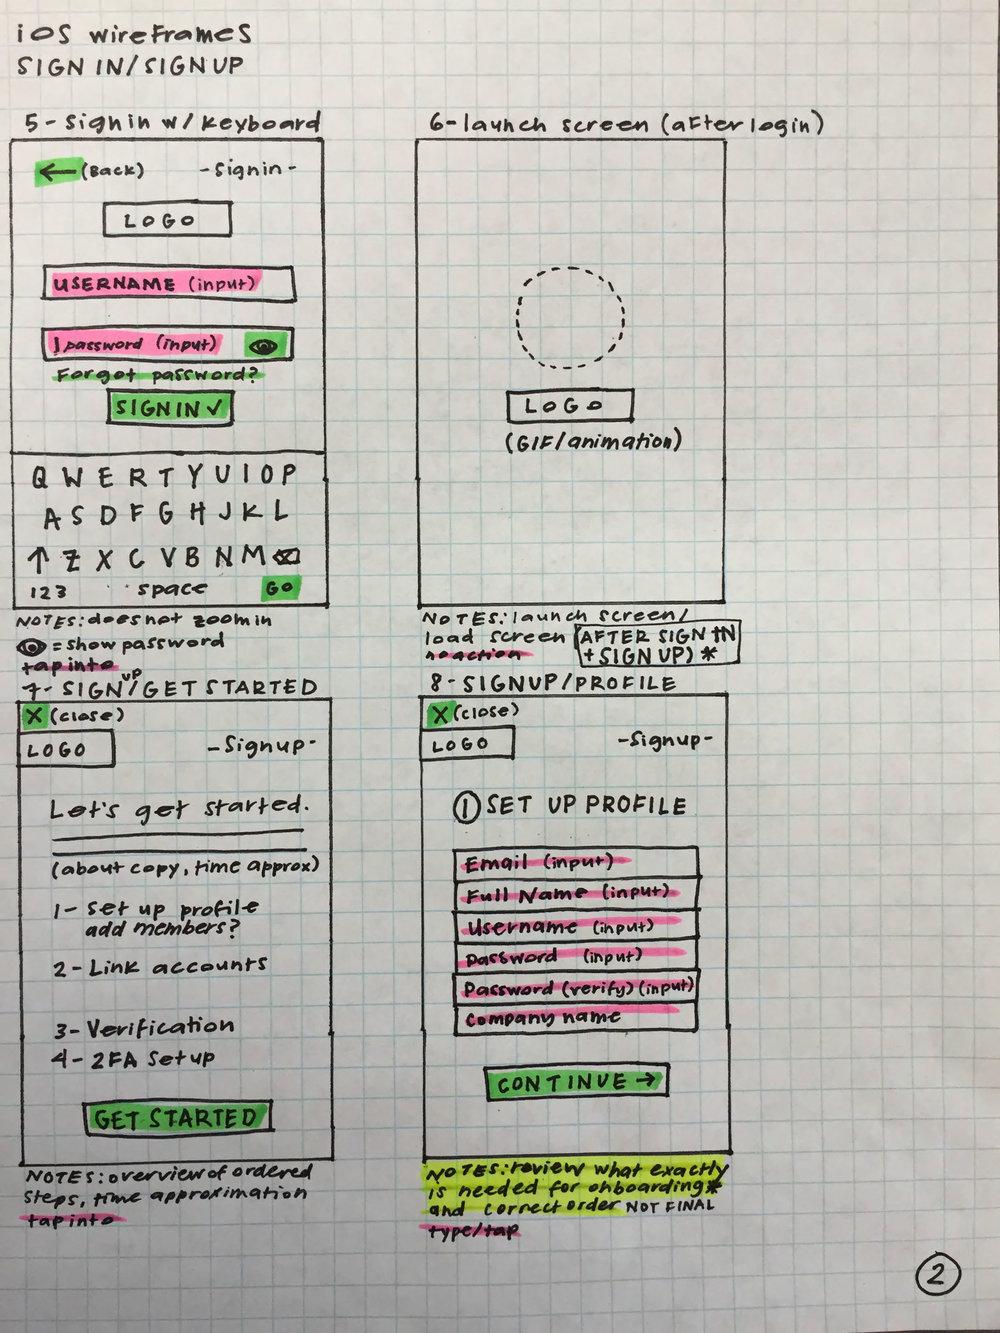 SEED_iOS_Wireframe_RI_Page_2.jpg